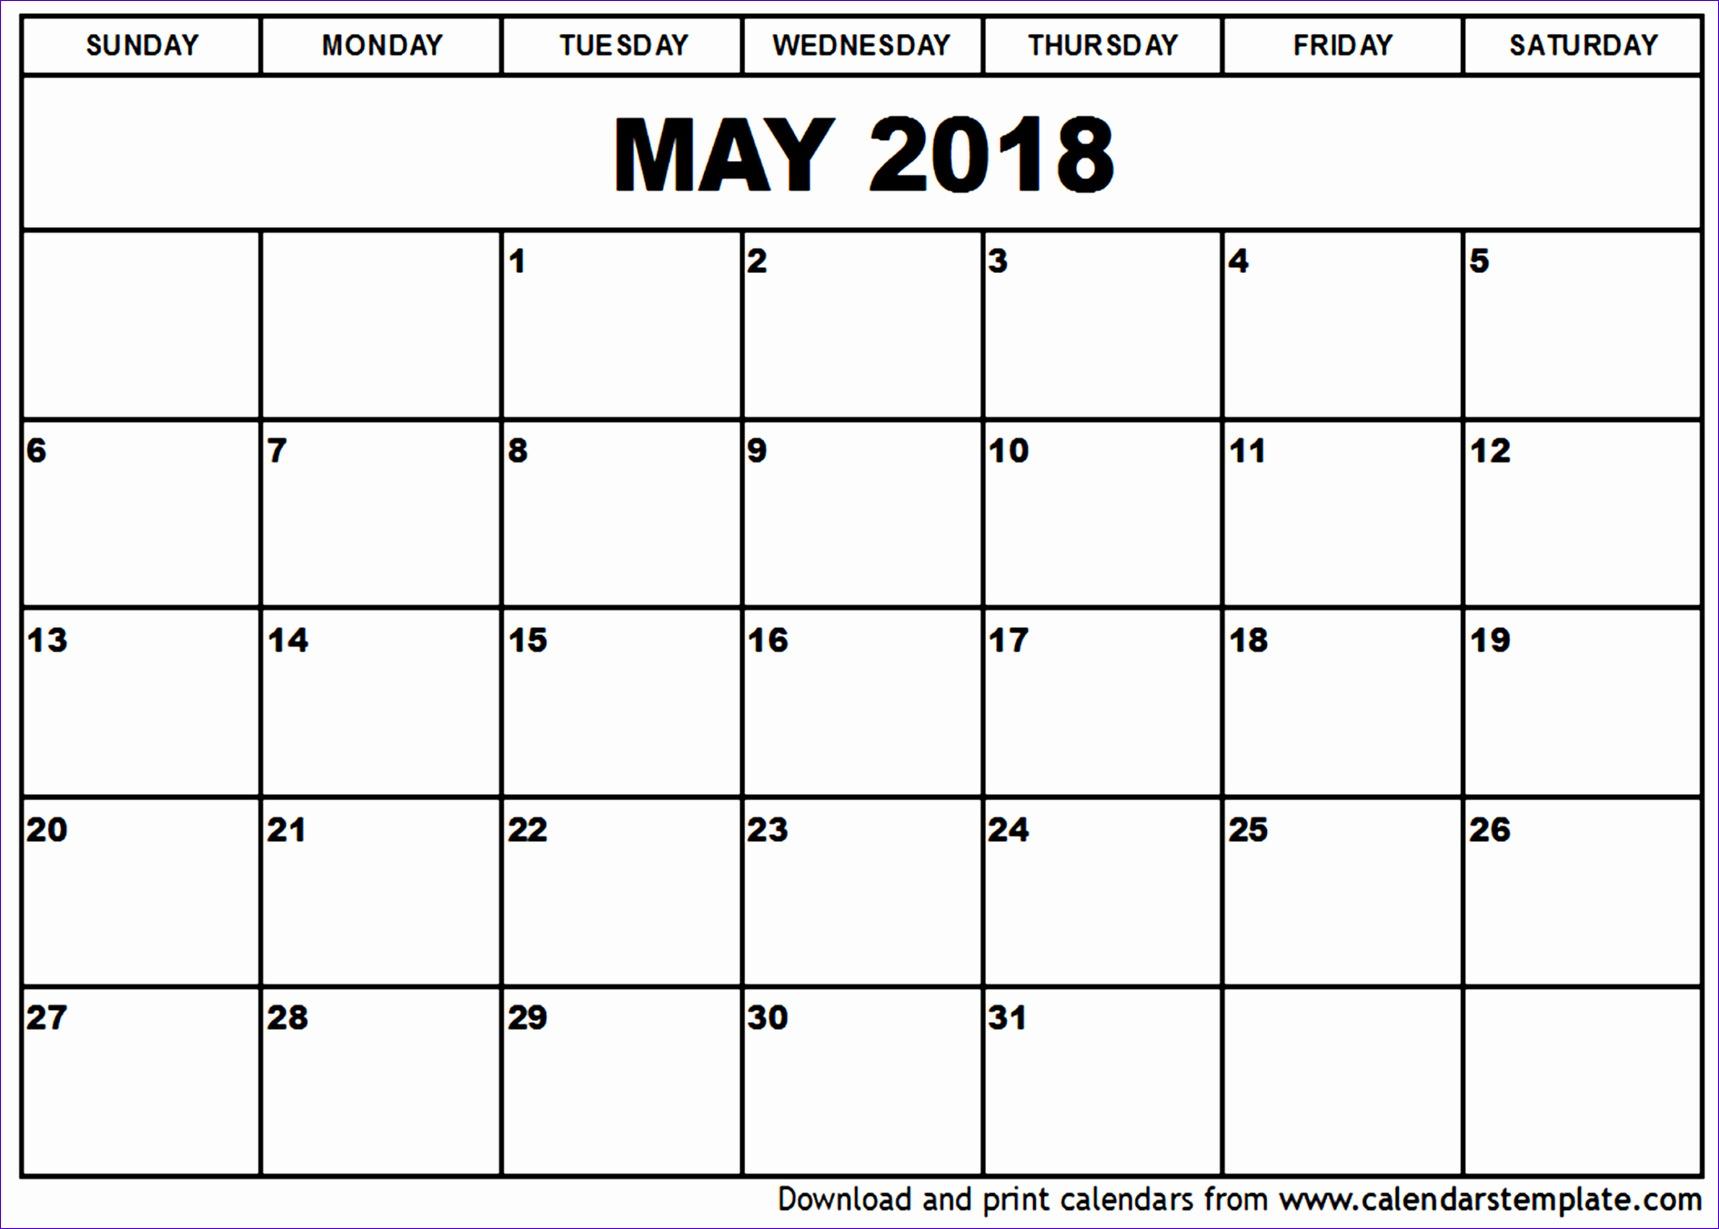 may 2018 calendar template 1685 17191229